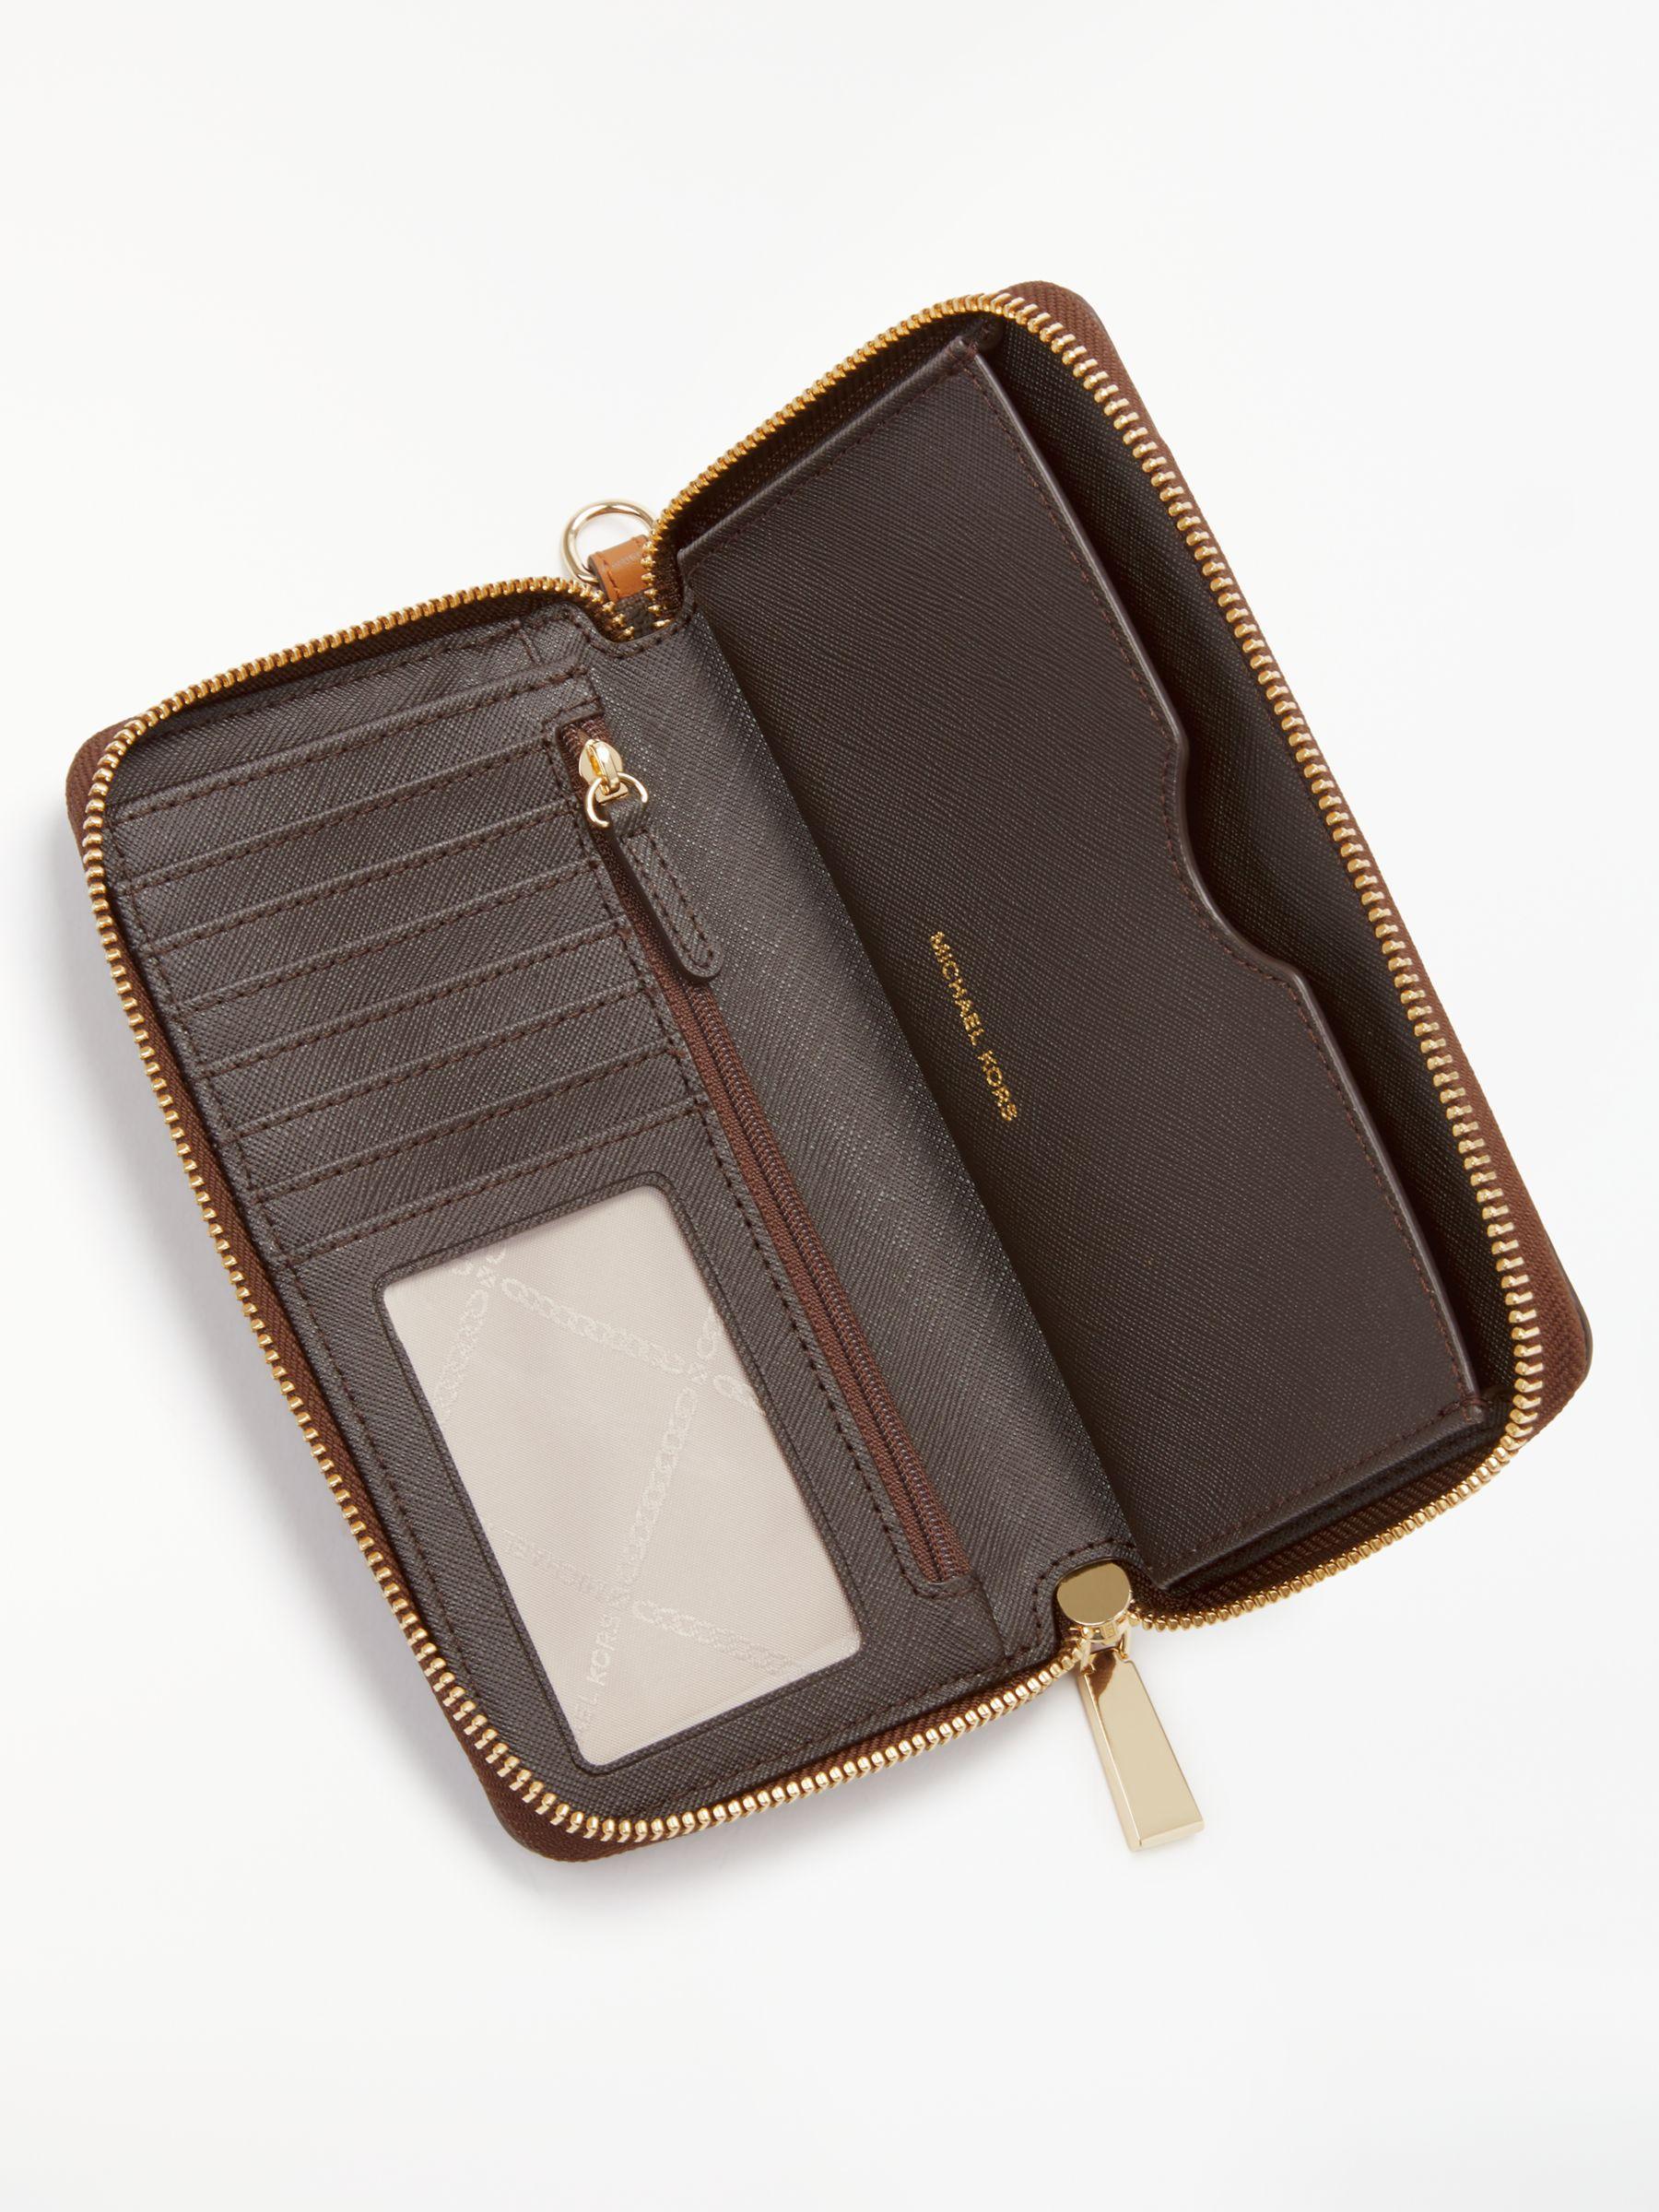 c9b4b8d6b88a Michael Kors Michael Jet Set Signature Travel Iphone Case Purse in Brown -  Lyst